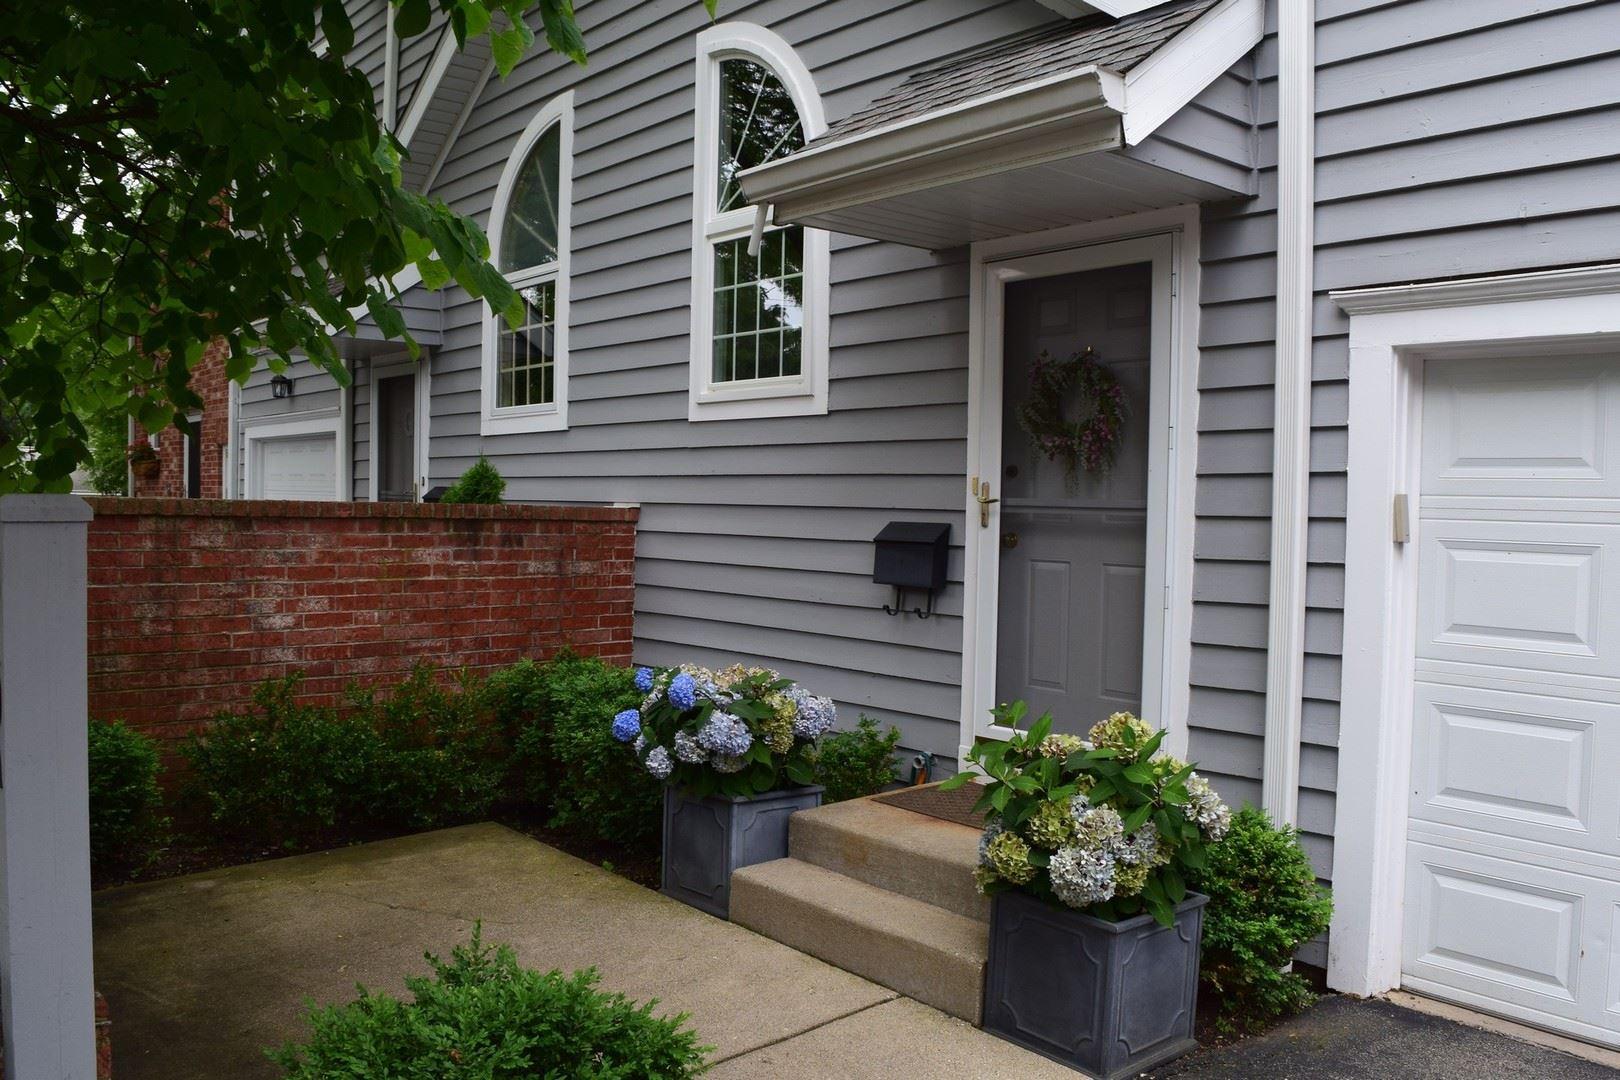 810 Chestnut Street #A, Deerfield, IL 60015 - #: 10796895